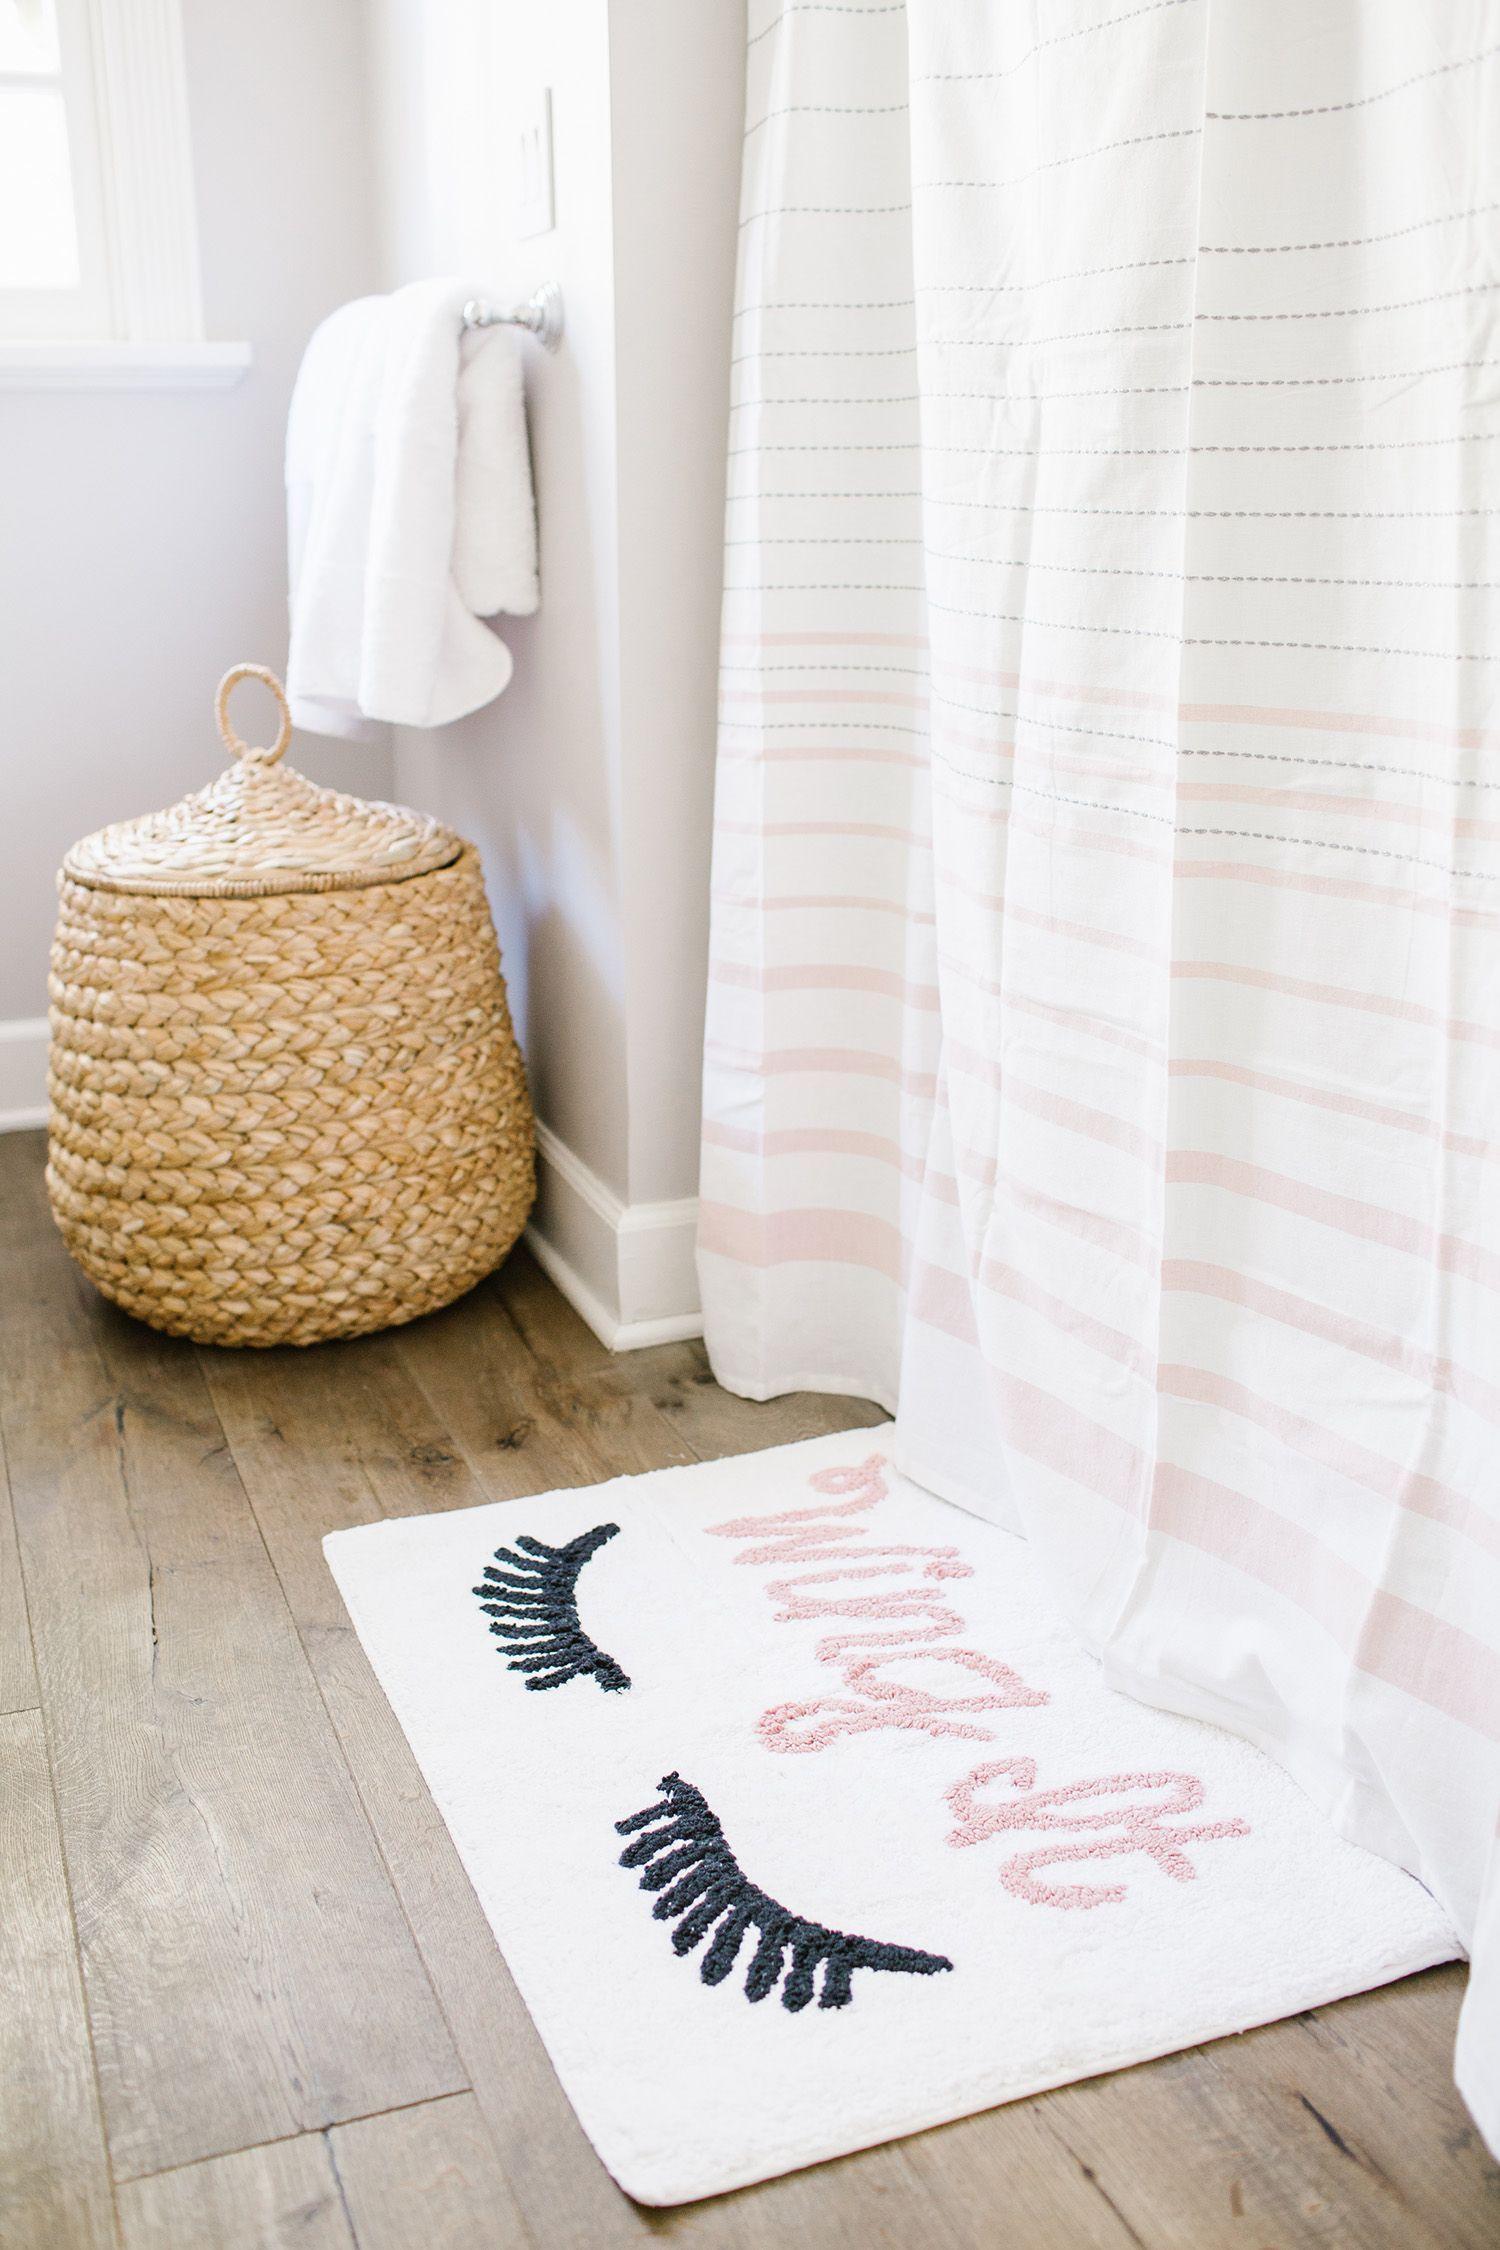 Monday Mood Via Lclaurenconrad Available At Kohl S Dreambathrooms Bathroom Rugs Modern Bathroom Decor Diy Home Decor Bedroom